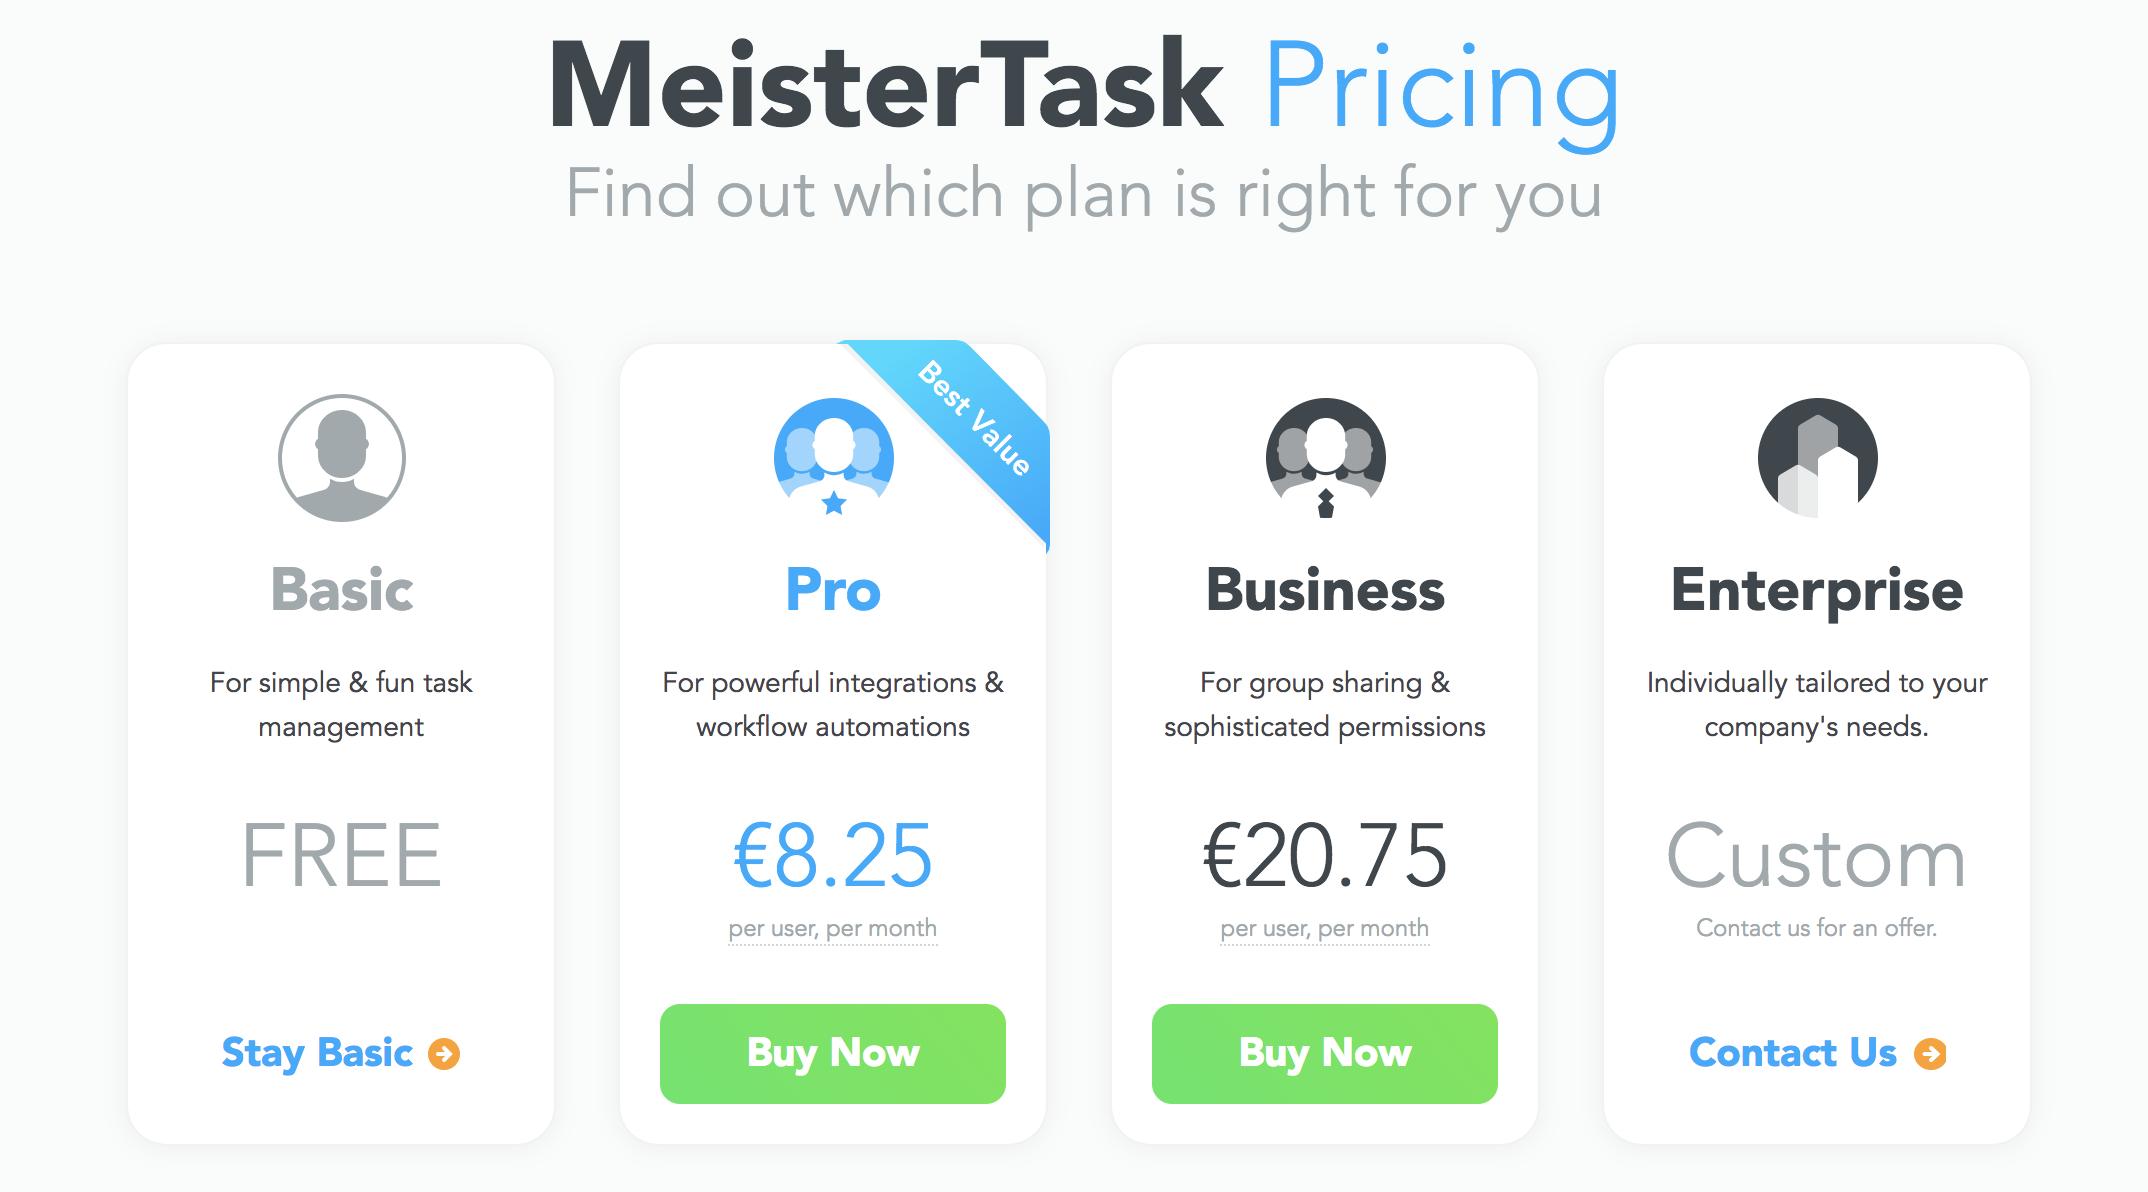 MeisterTask Pricing